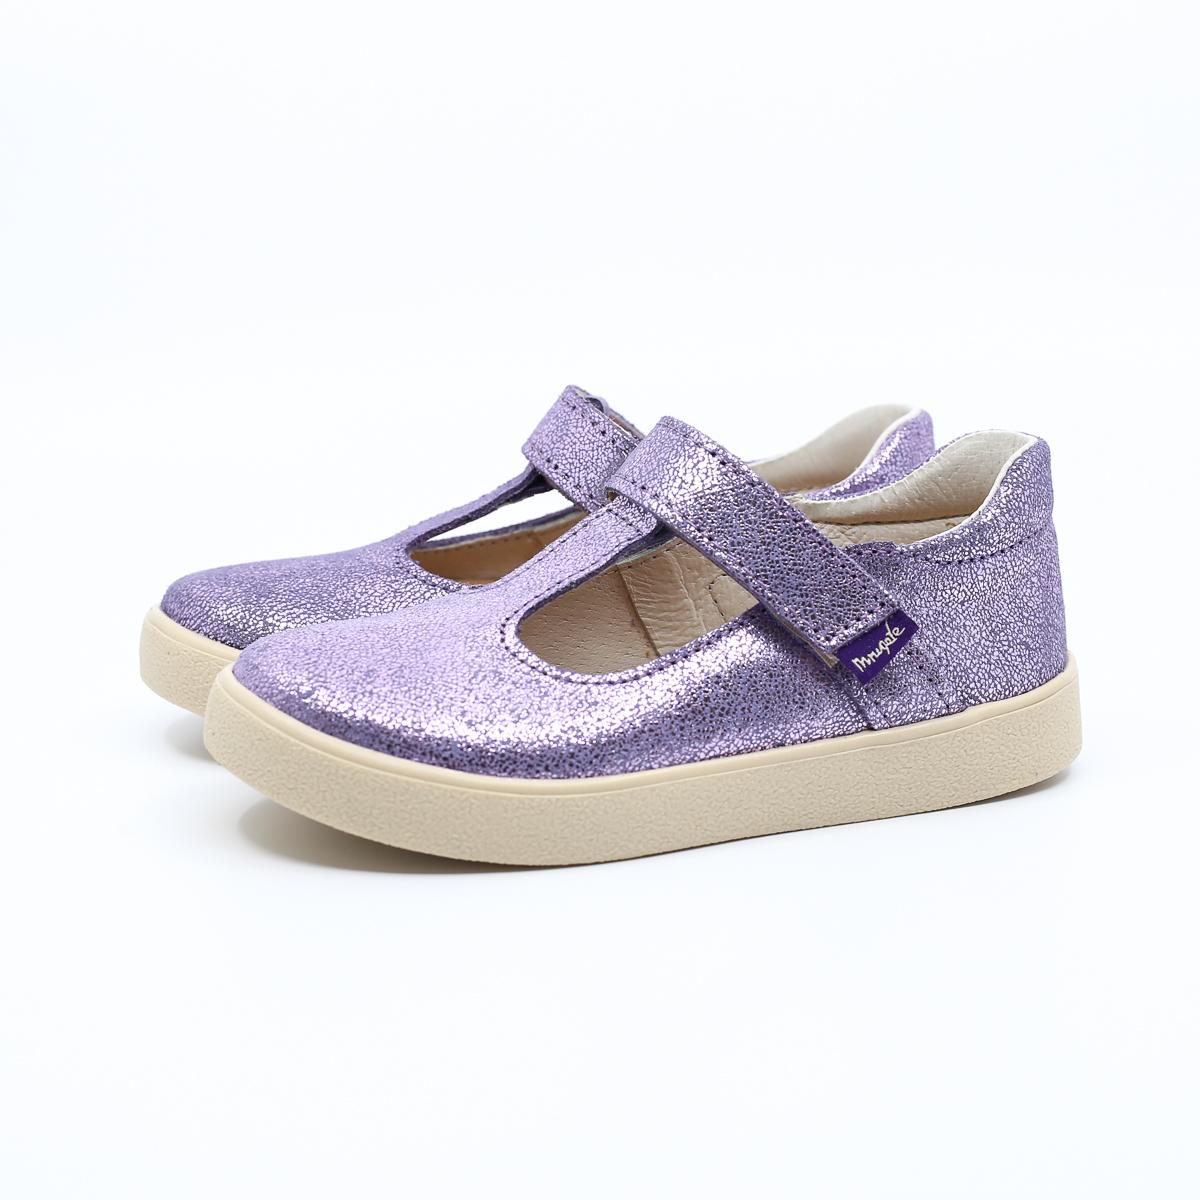 MRUGAŁA baleriny dziecięce NINA lavender brokat 26-30